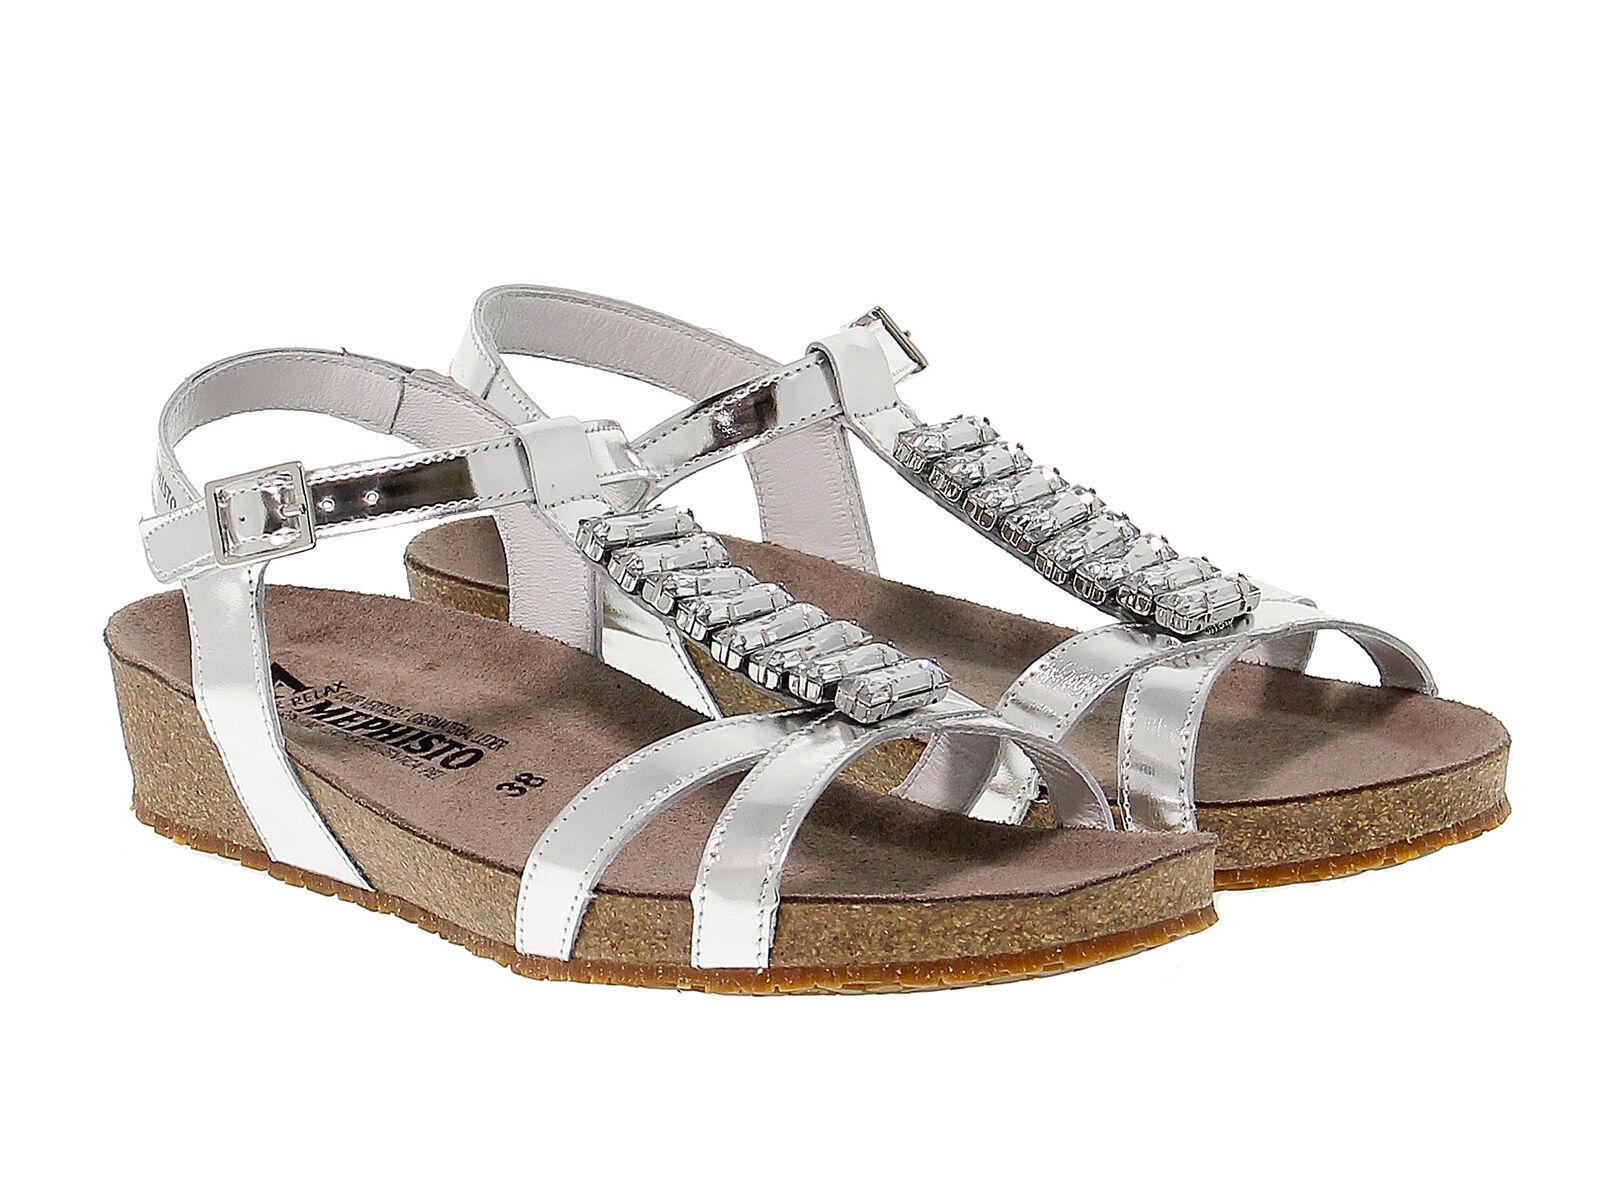 Sandalia plana MEPHISTO IBELLA de cuero plata - Zapatos Mujer